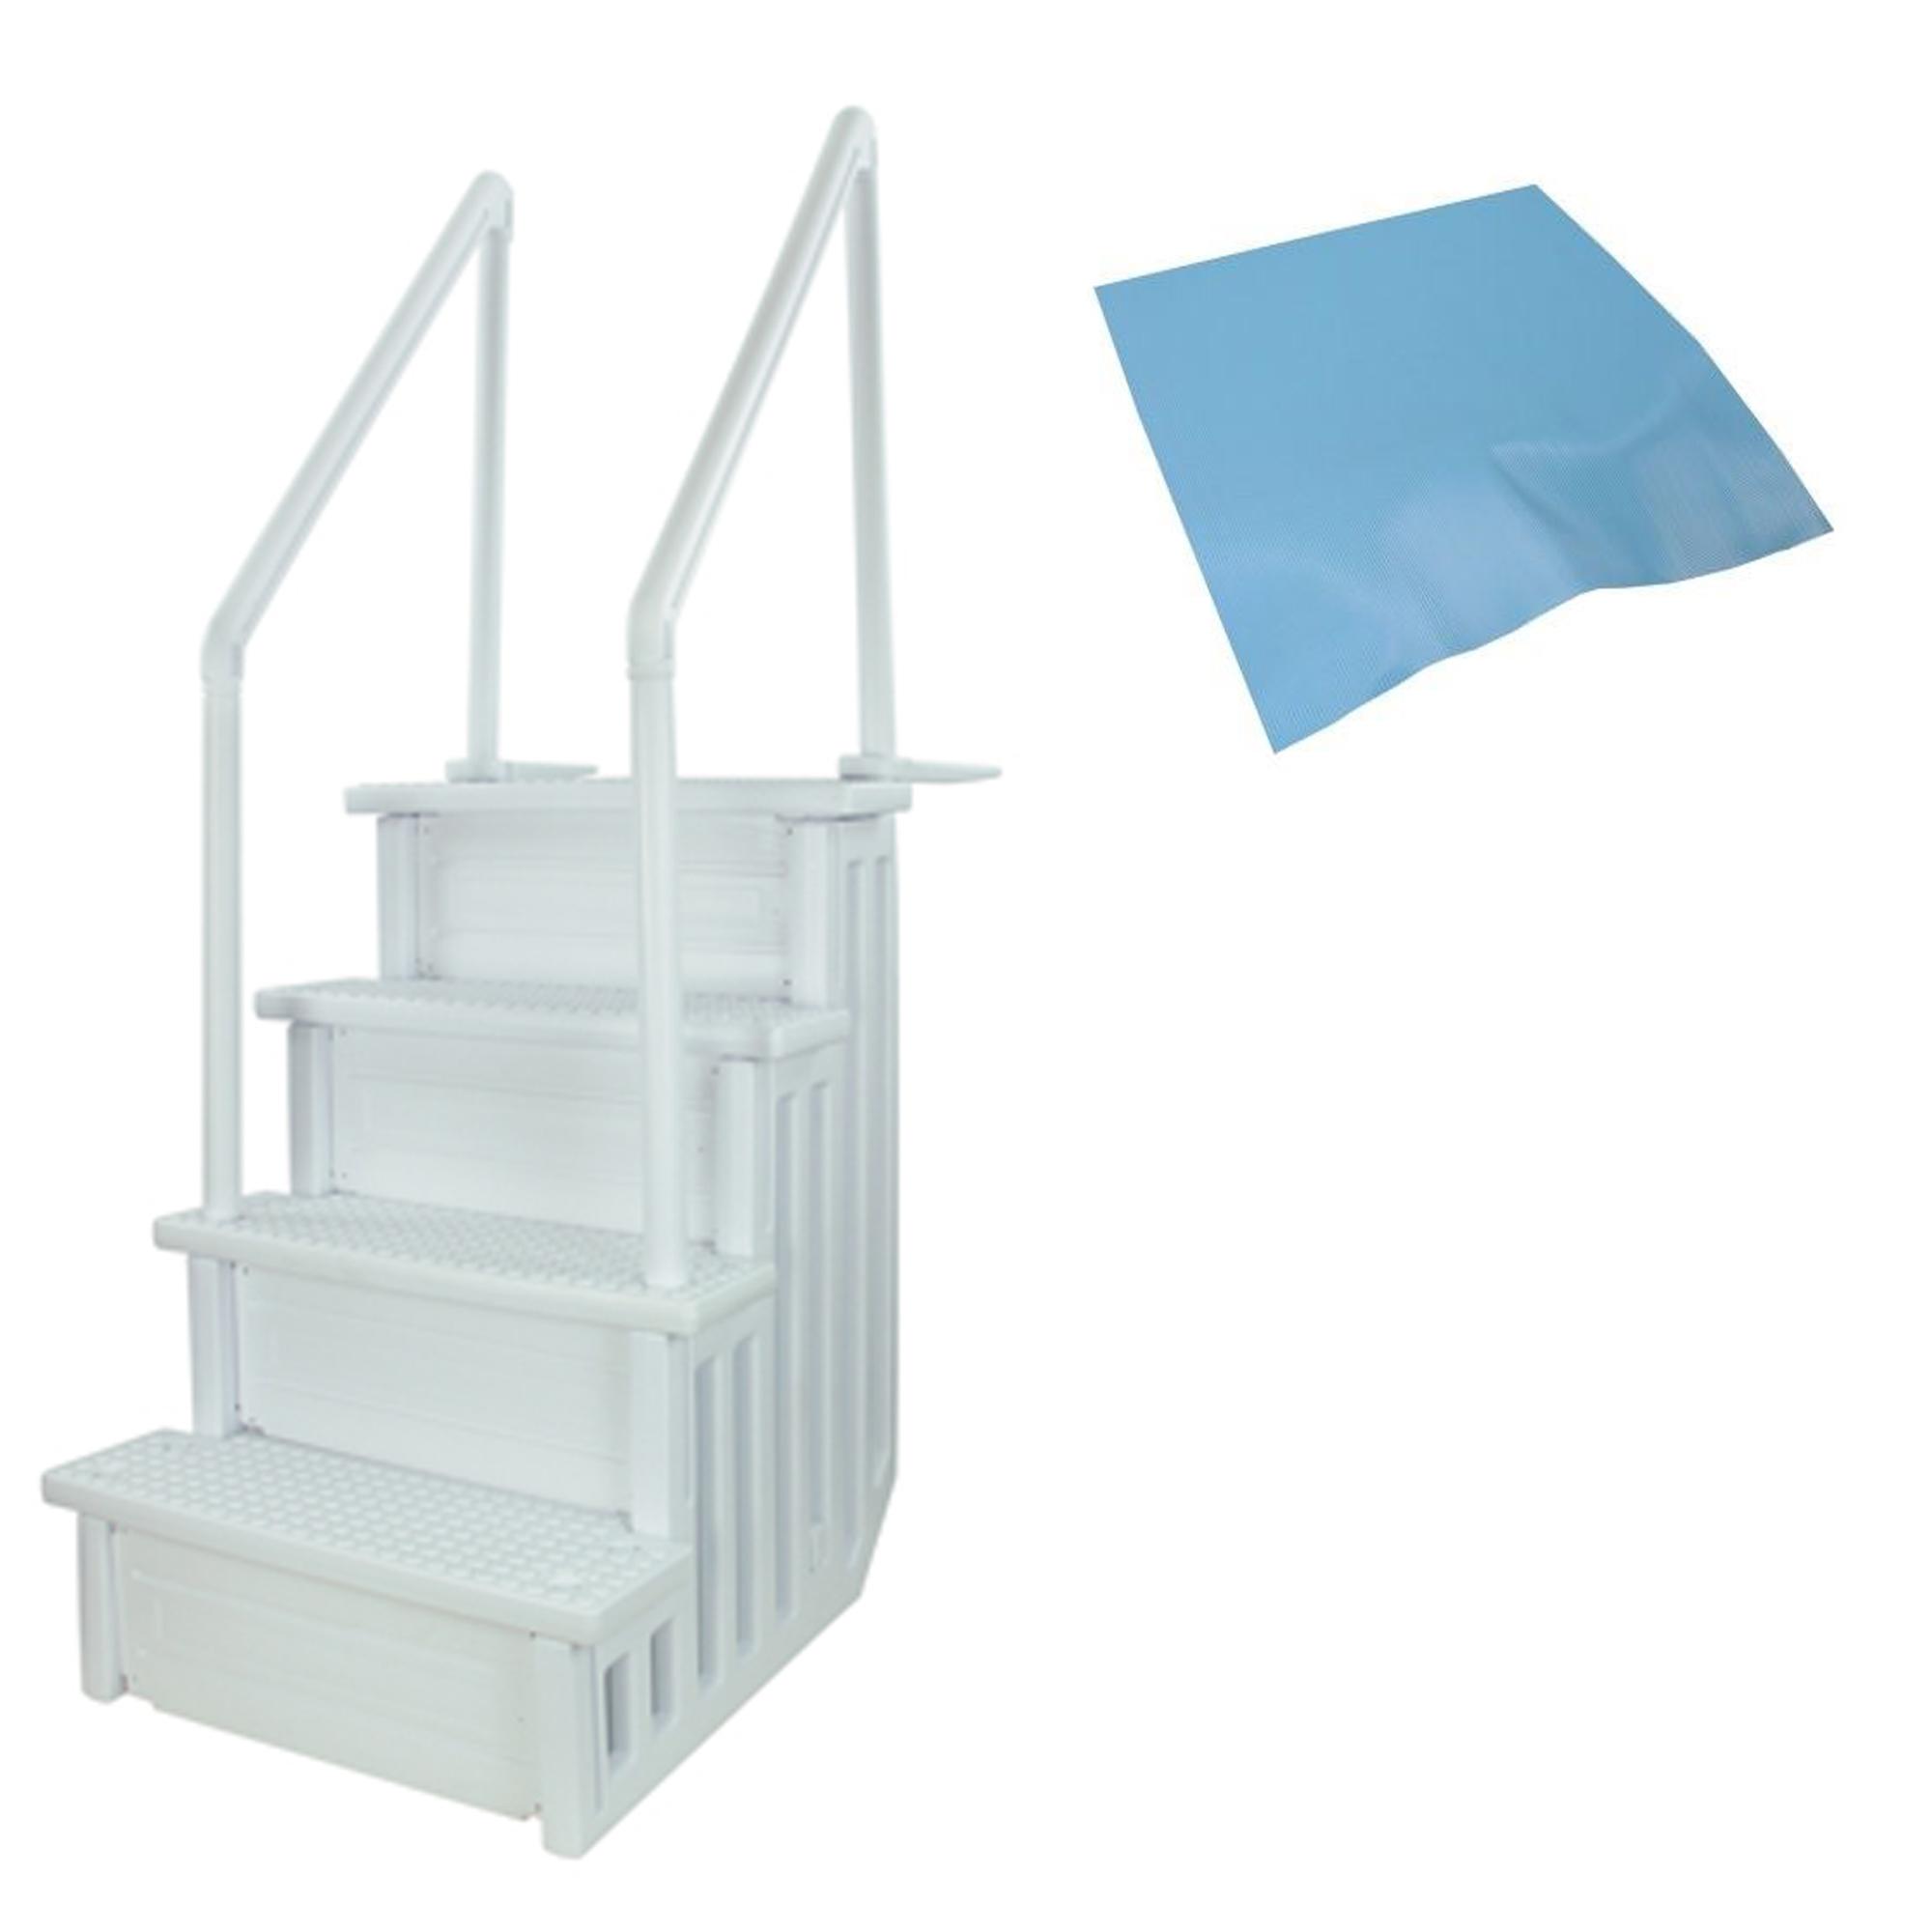 28 wide anti slip above ground swimming pool step ladder - Above ground swimming pool step pad ...